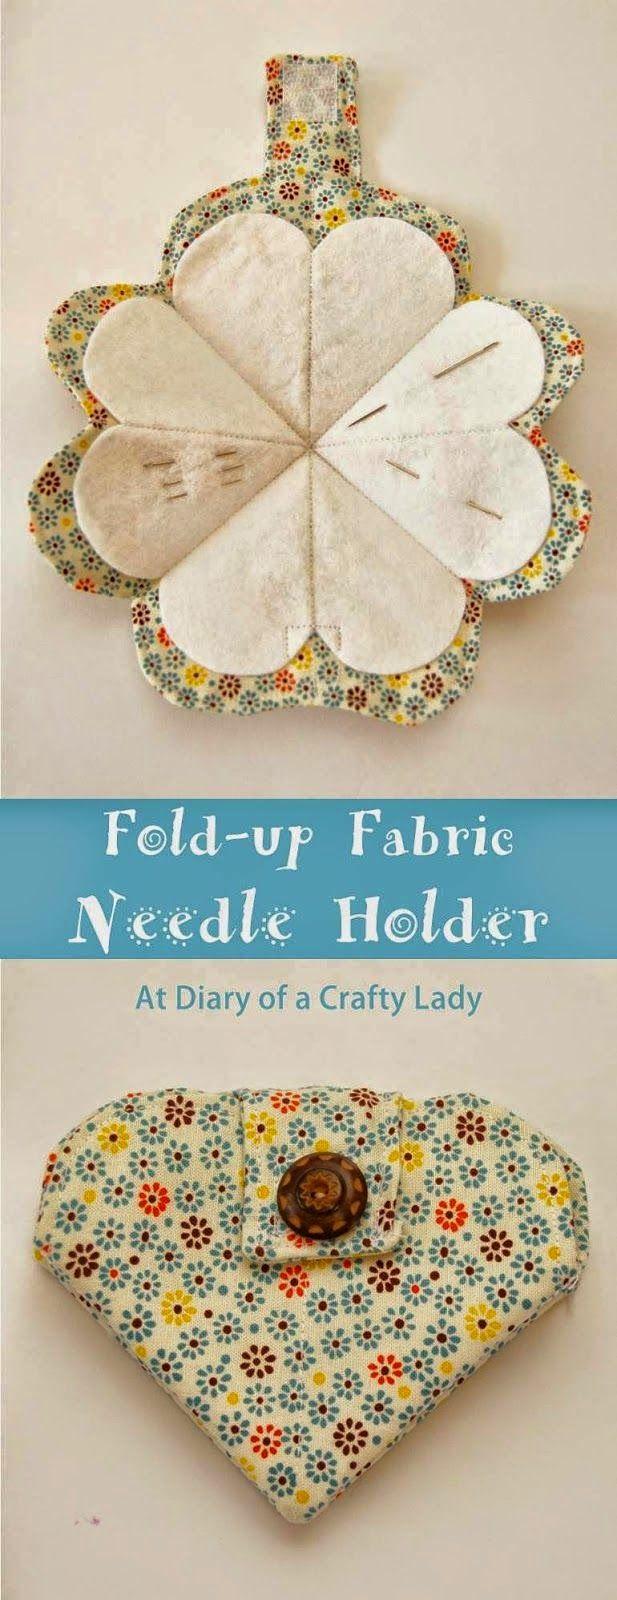 Fold-up Fabric Needle Holder - tutorial … | Sew What? | Pinterest ...